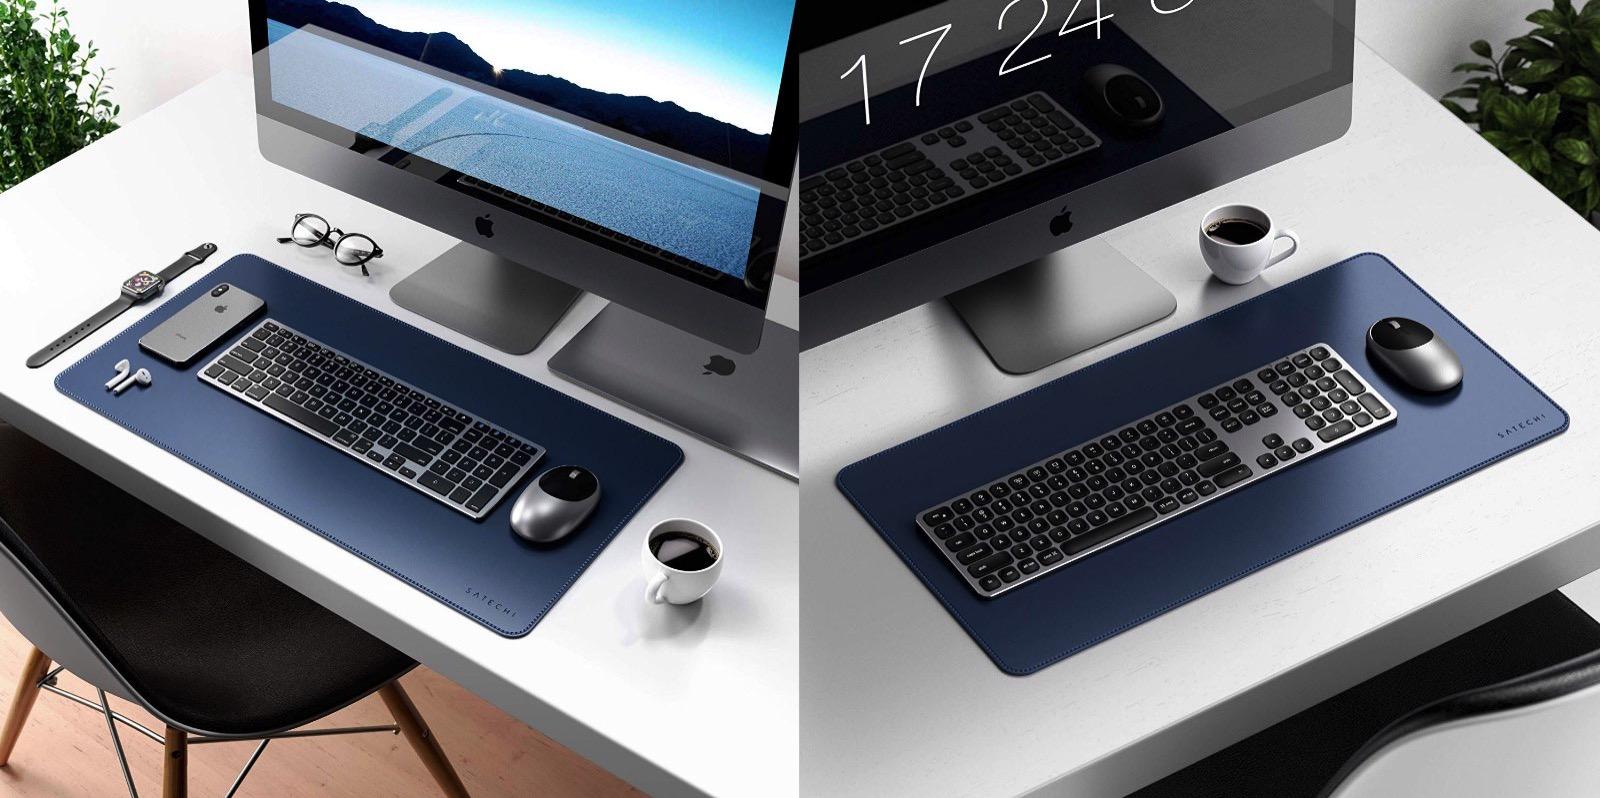 Satechi-Desk-Mat-Coming-August-1st-3.jpg